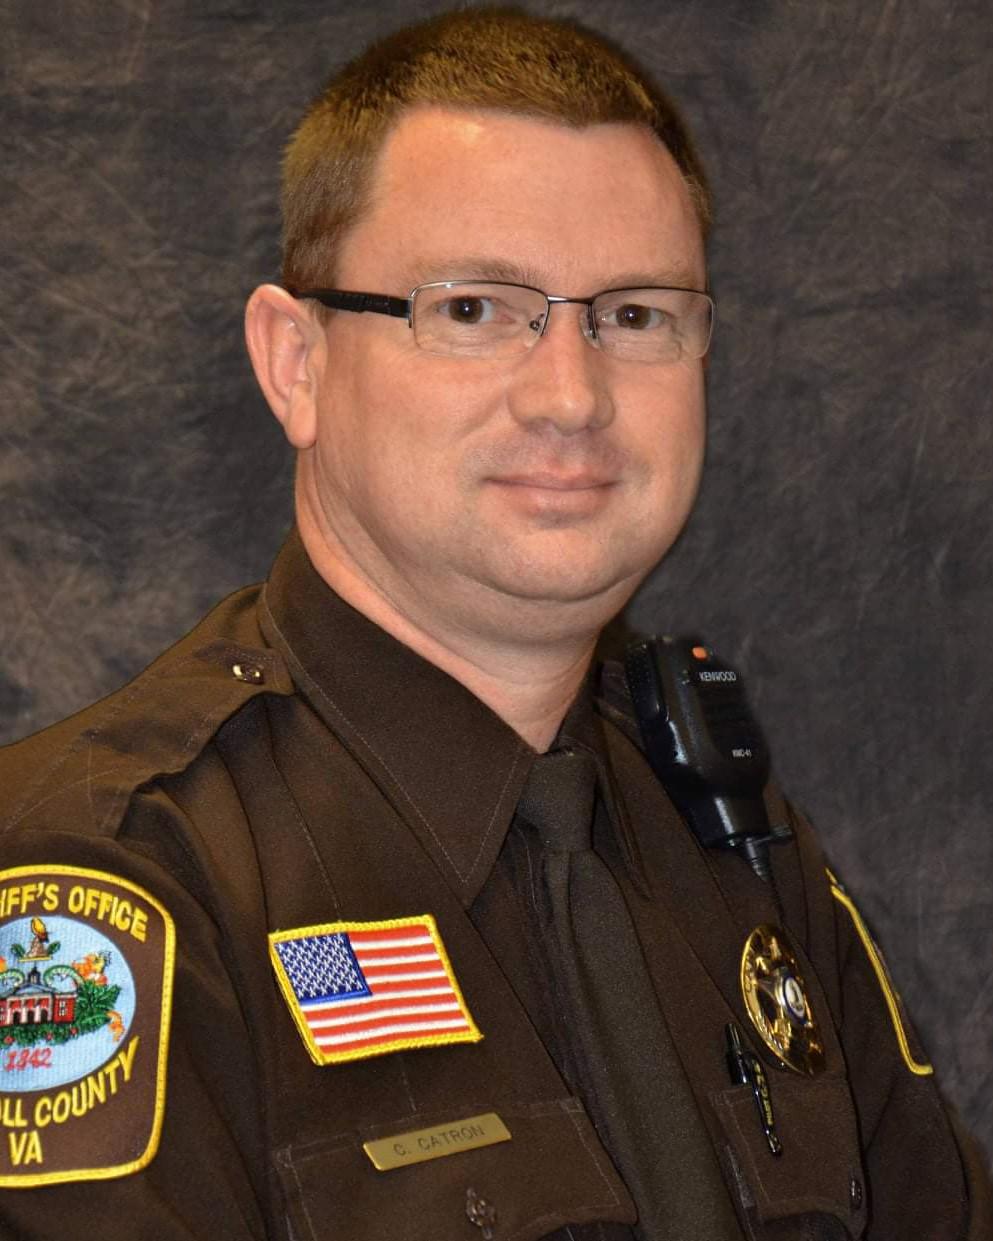 Corporal Charles Wayne Catron   Carroll County Sheriff's Office, Virginia